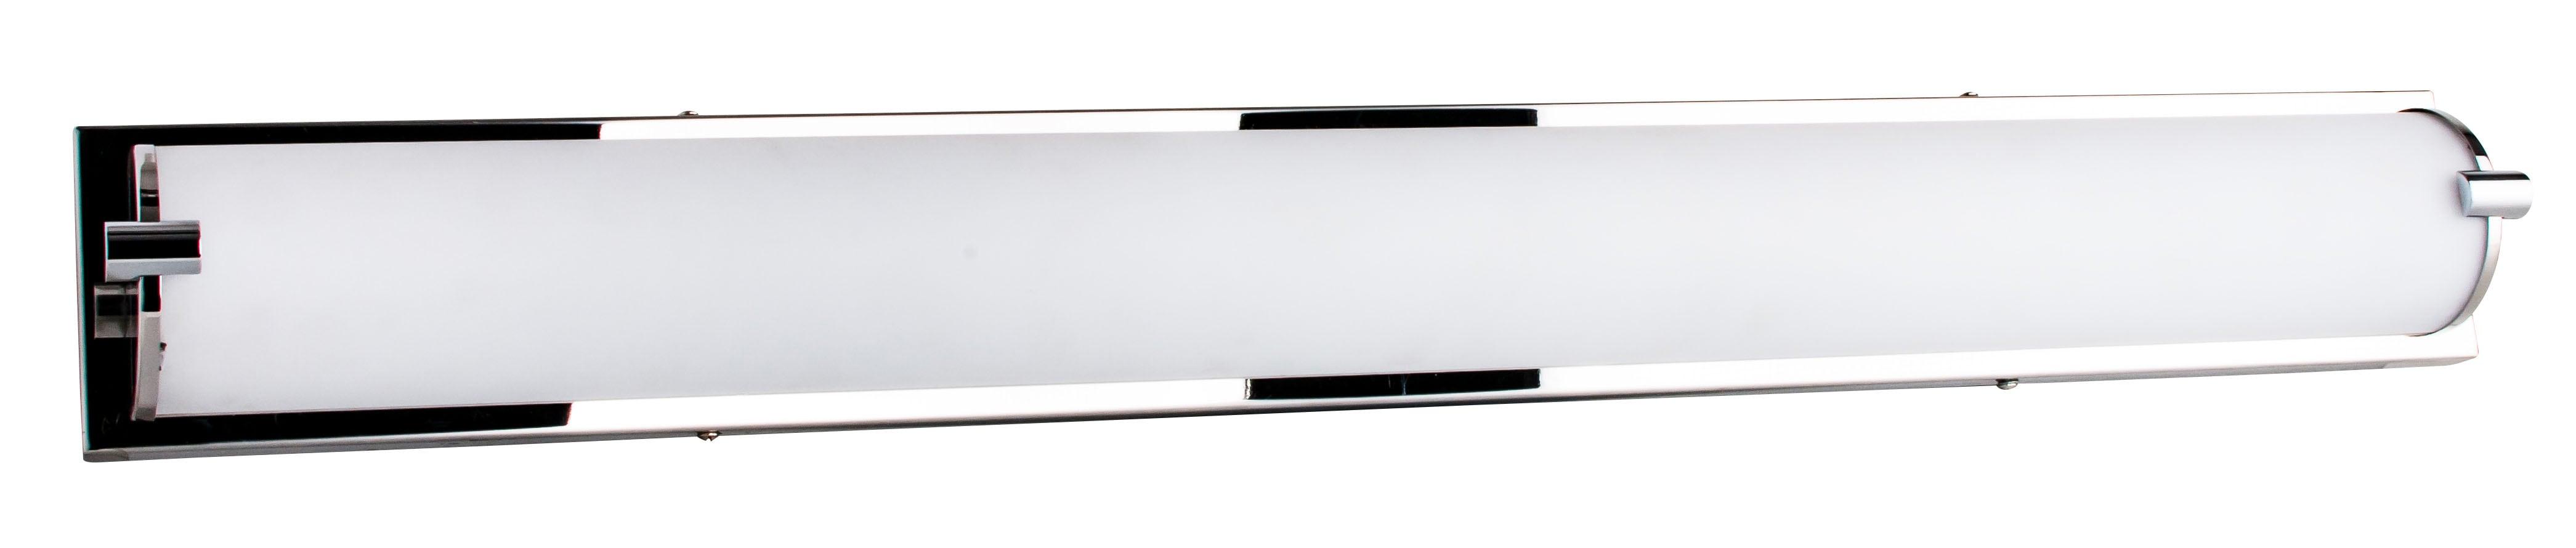 Lampă de perete Romy chromowany / LED alb 40W